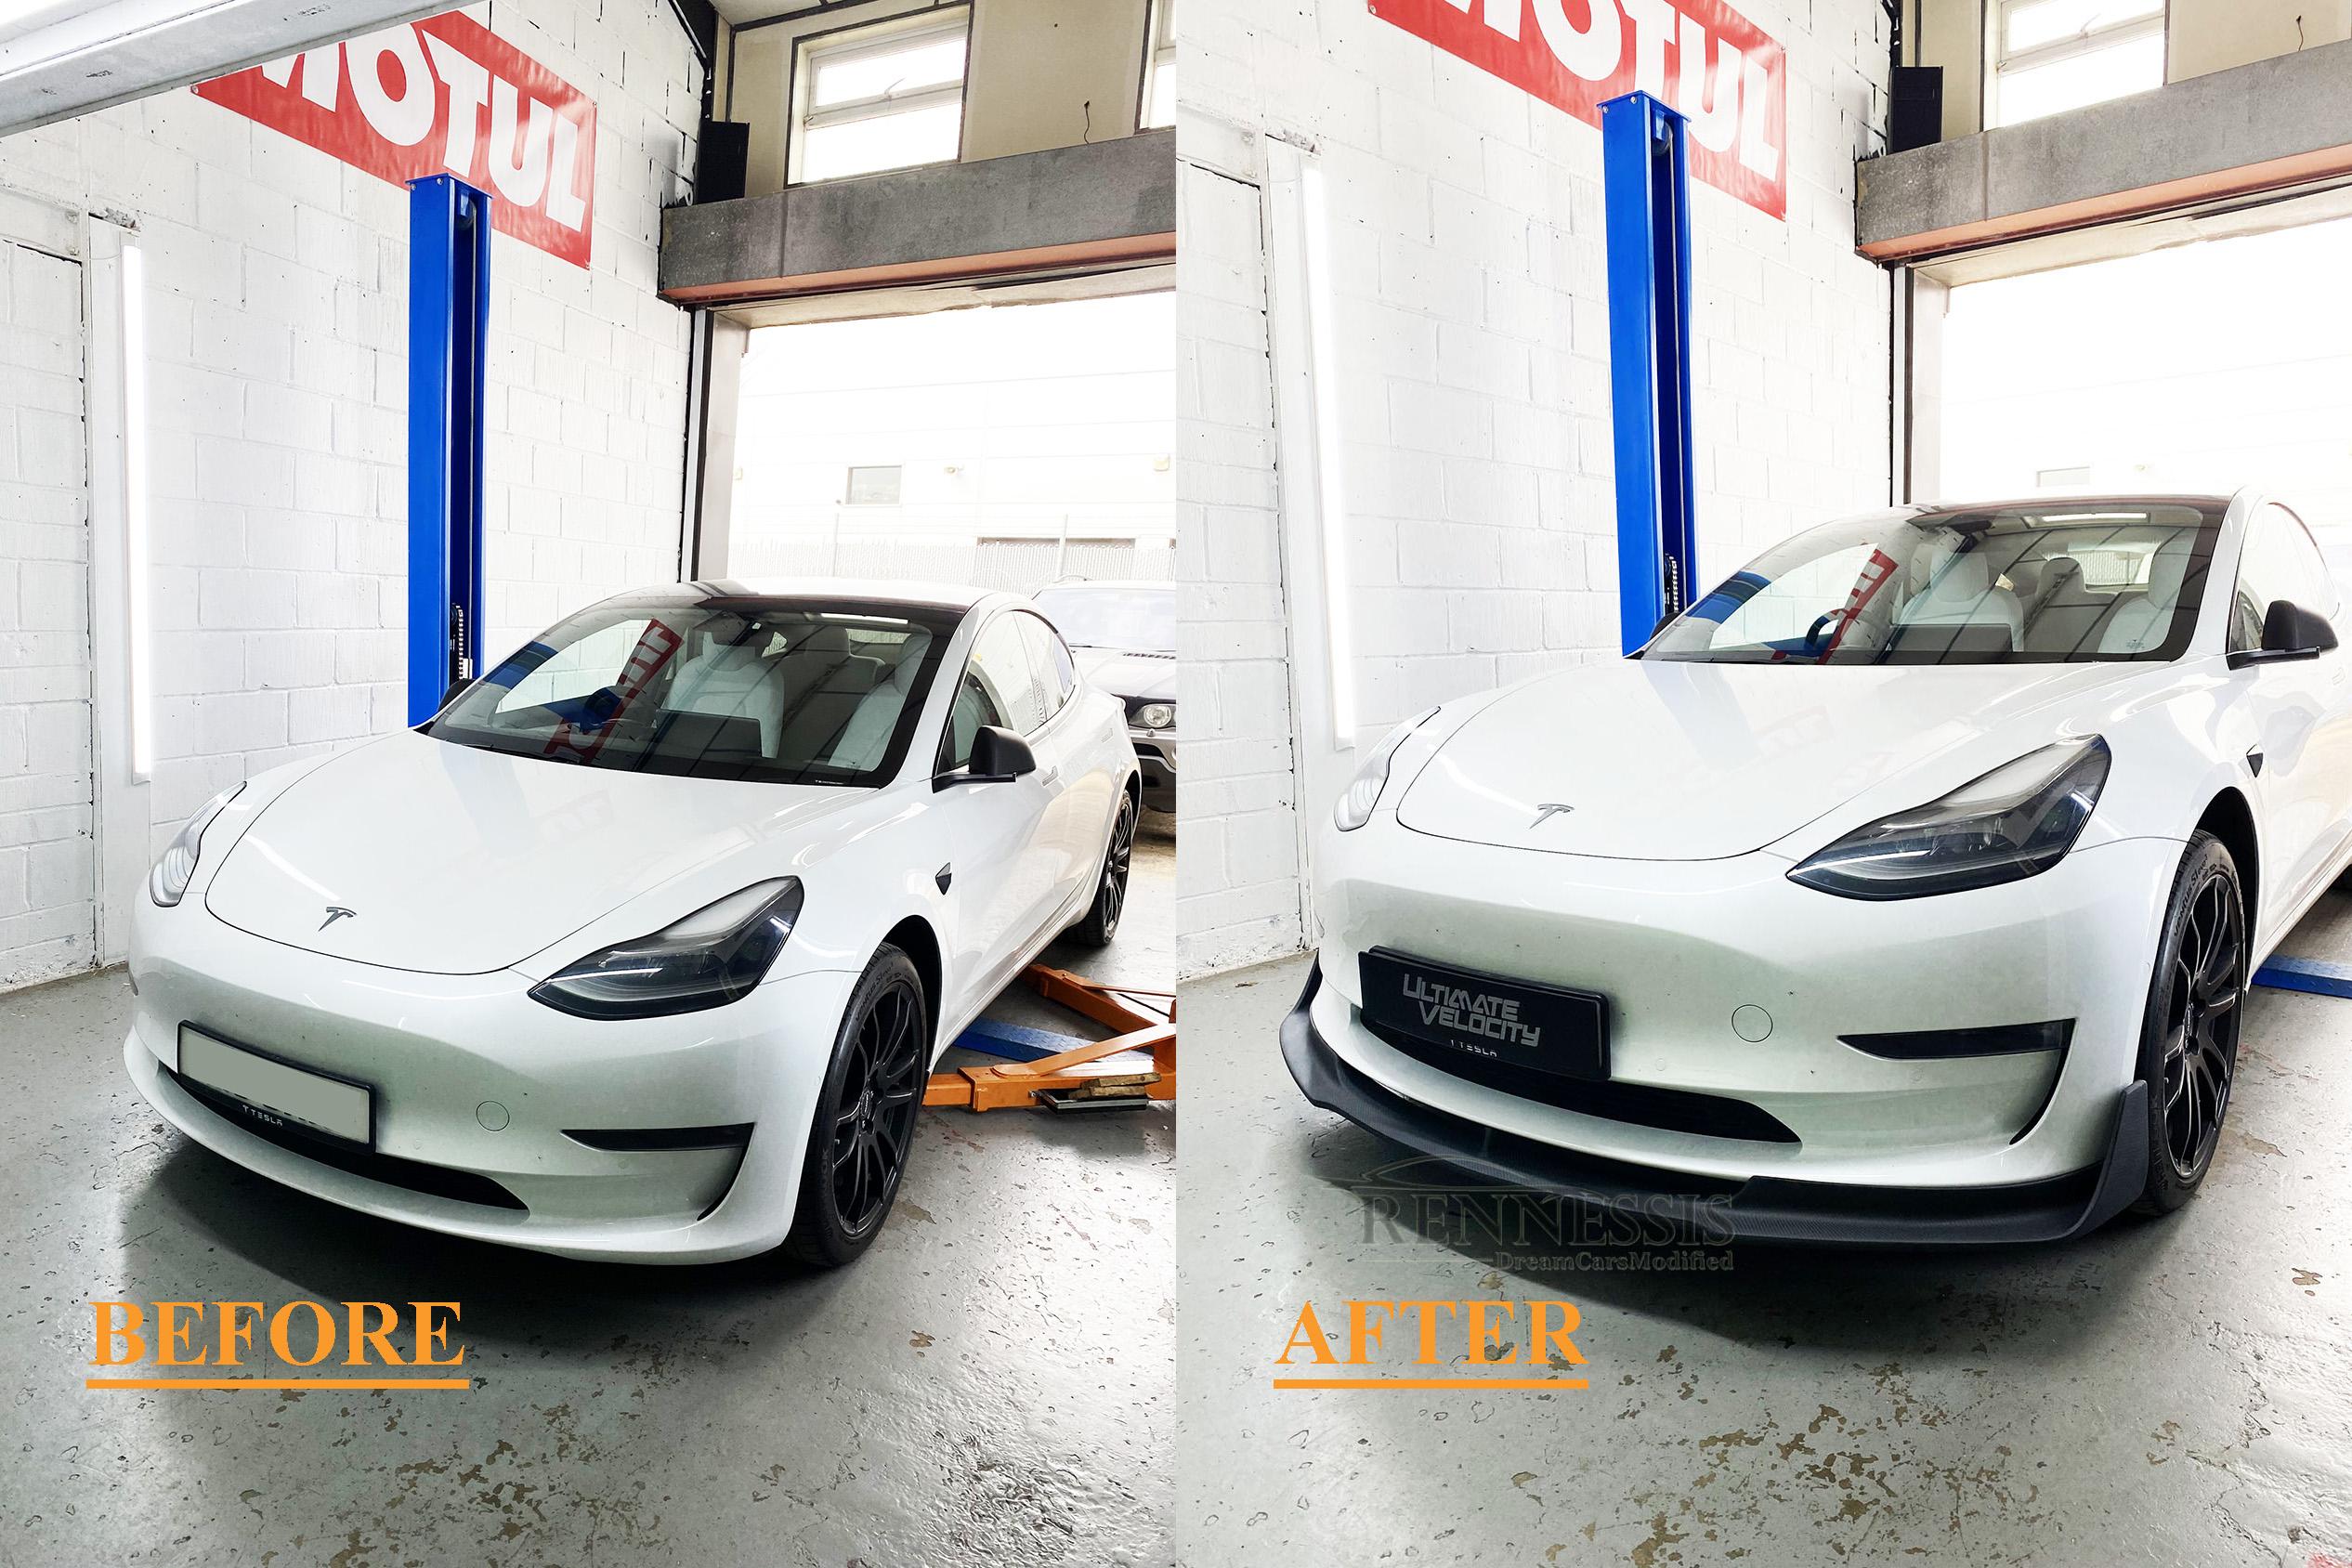 telsa-model-3-matt-matte-genuine-carbon-fibre-front-lip-splitter-vorsteiner-installed-before-and-after.jpg